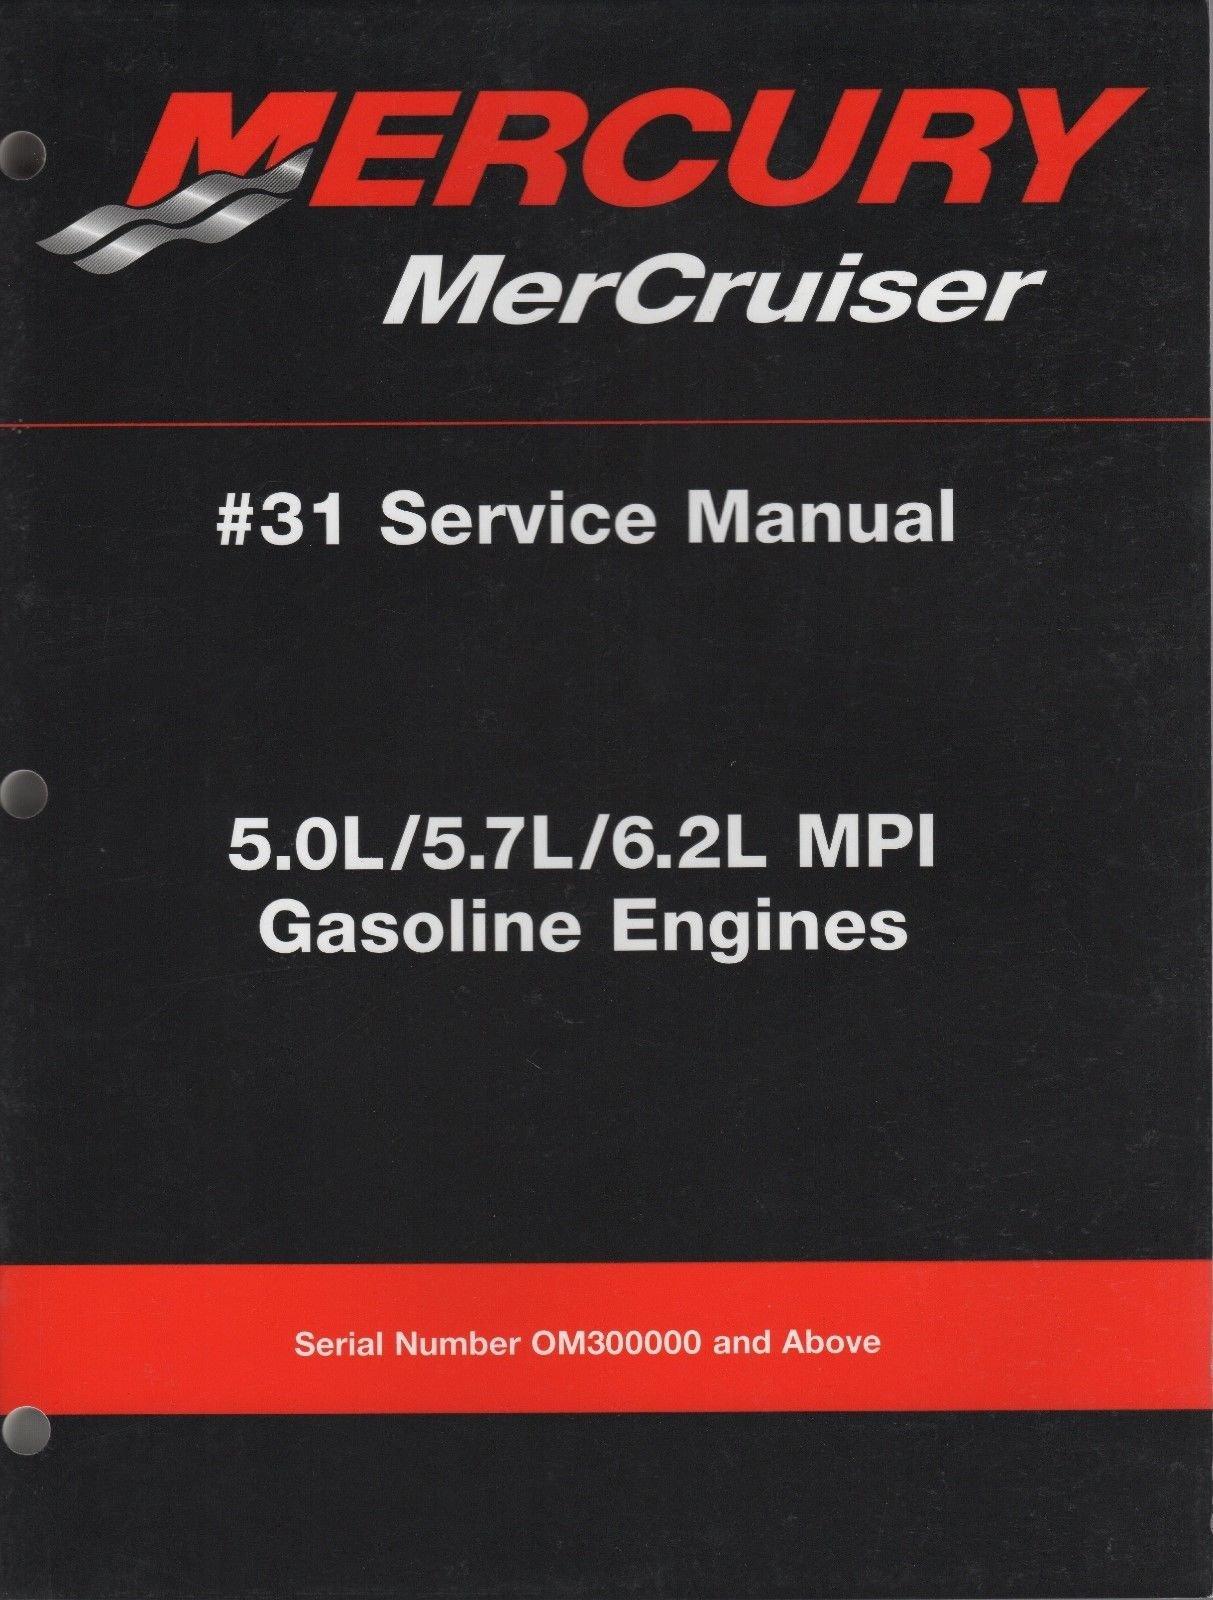 2002 MERCURY MERCRUISER # 31 5.0L/5.7L/6.2L MPI GASOLINE SERVICE MANUAL  (360): Mercury: Amazon.com: Books